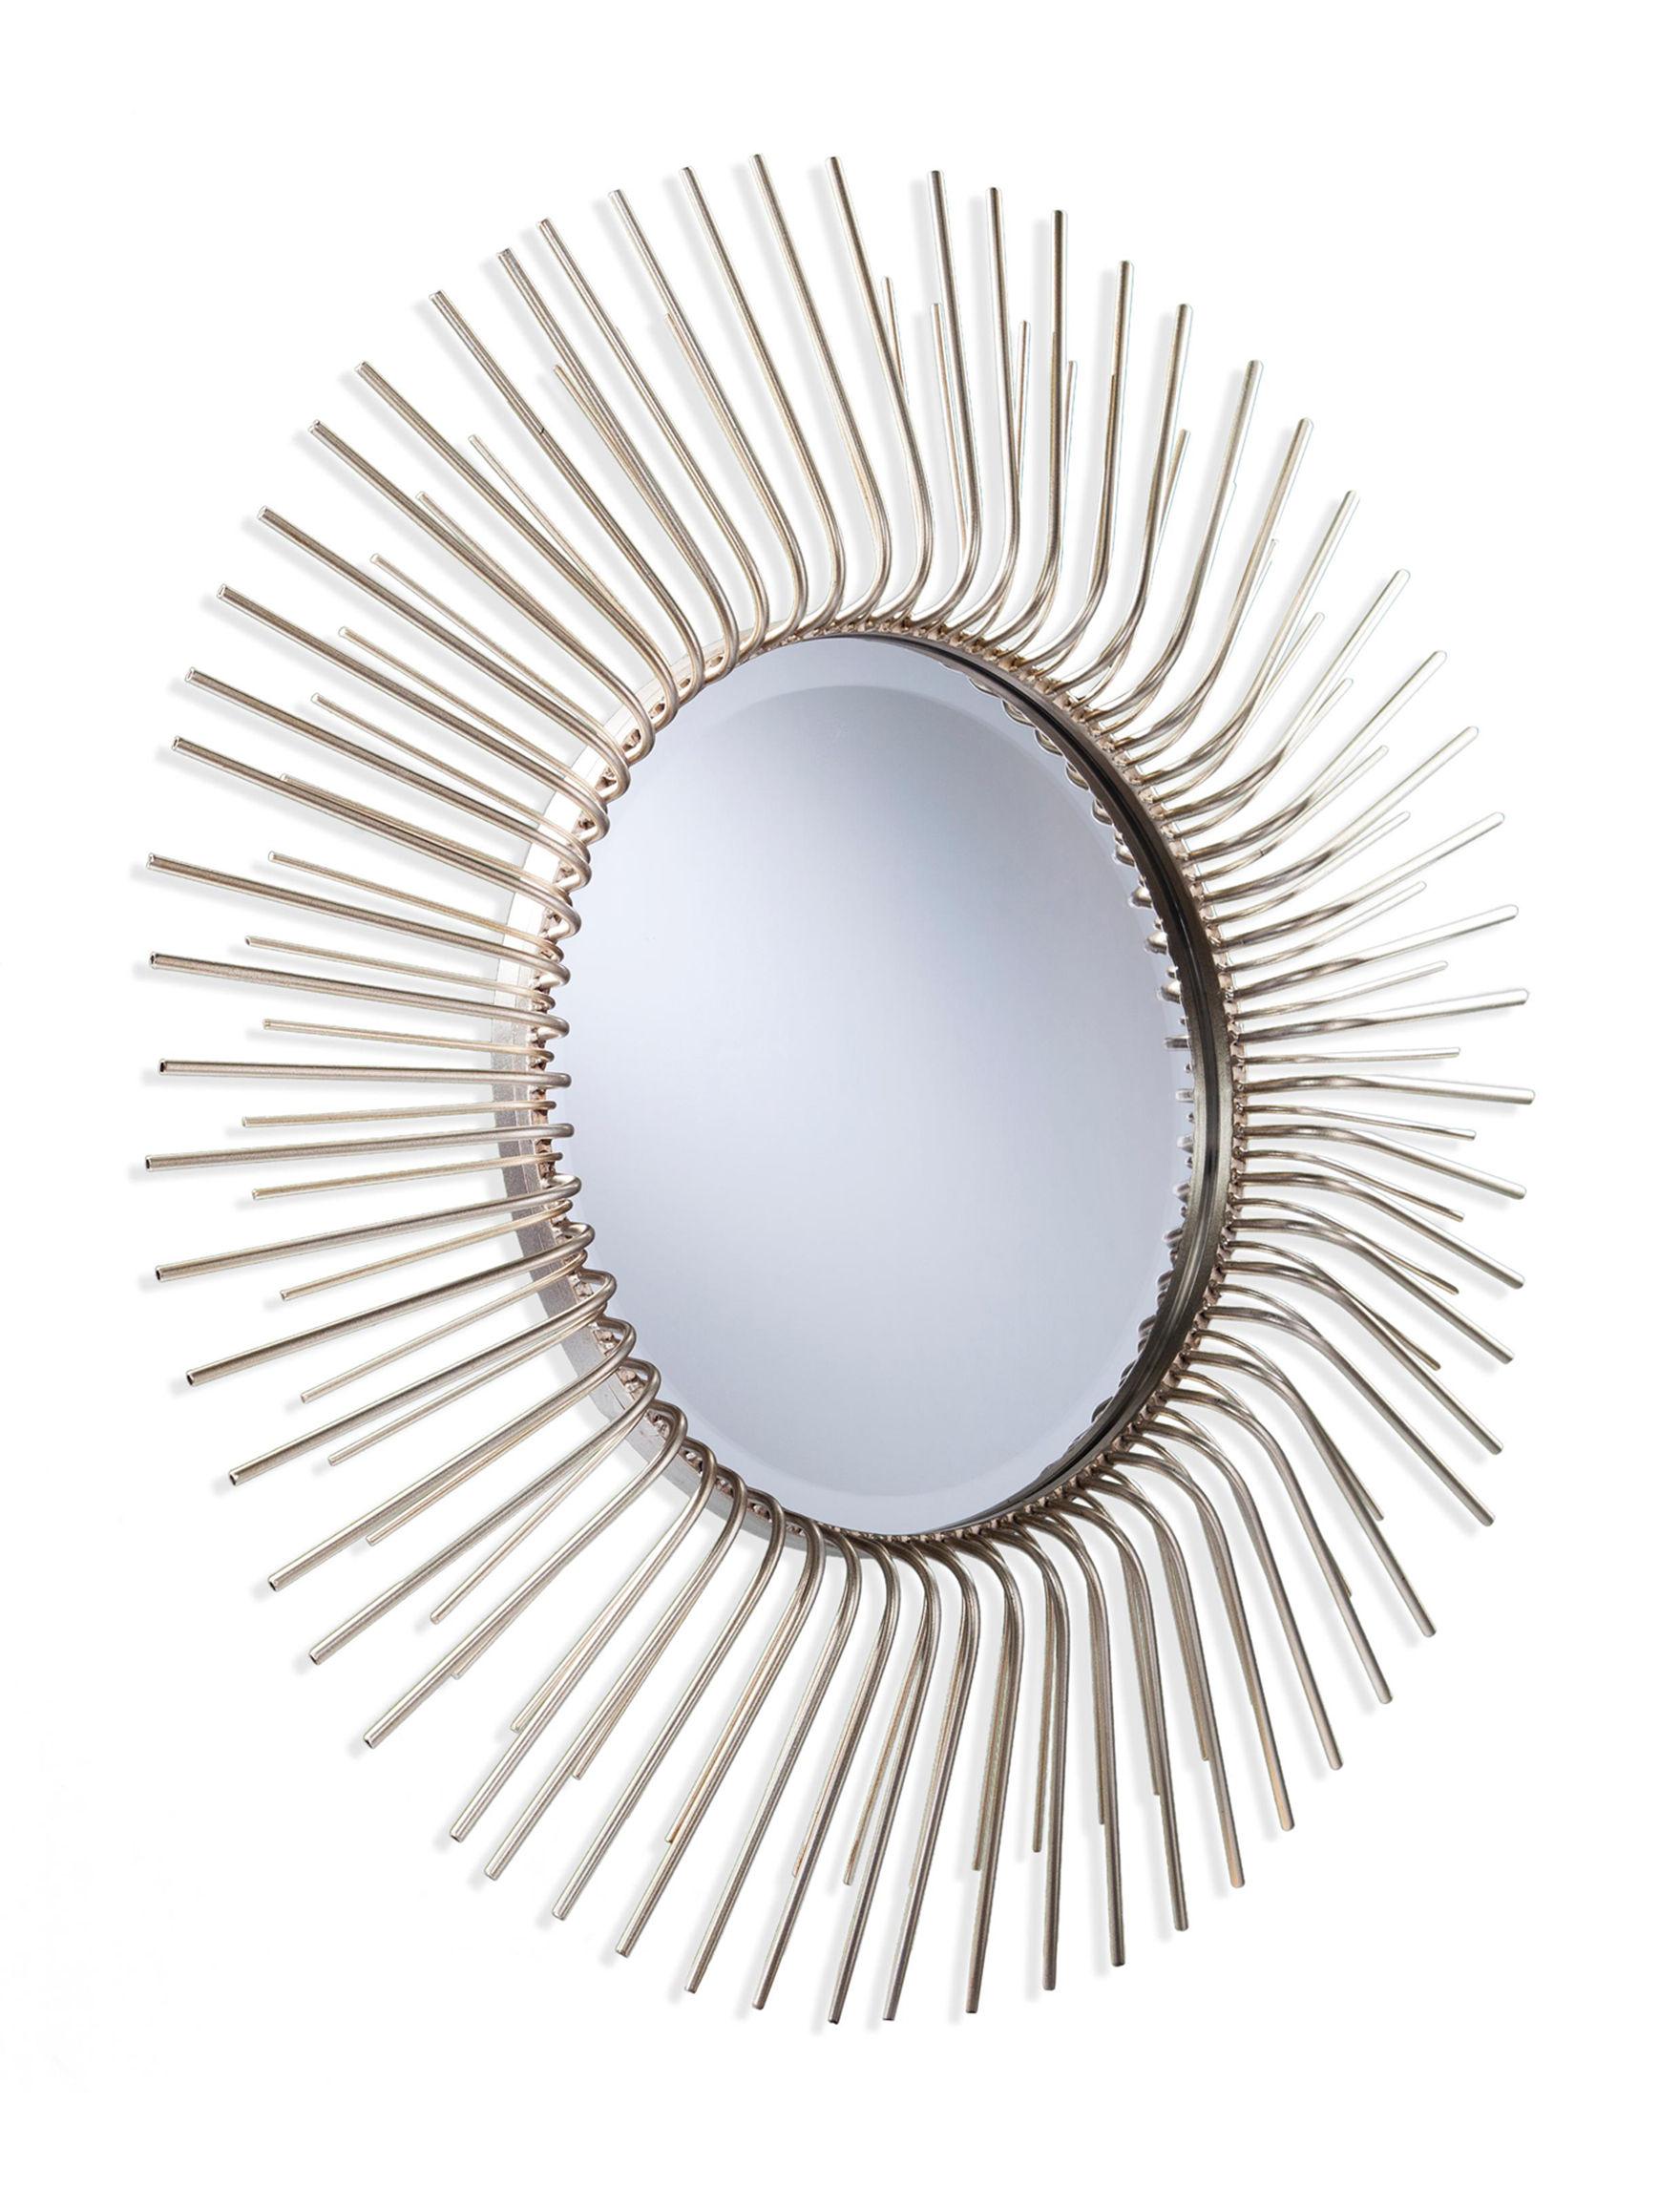 Southern Enterprises Trycille Round Sunburst Wall Mirror